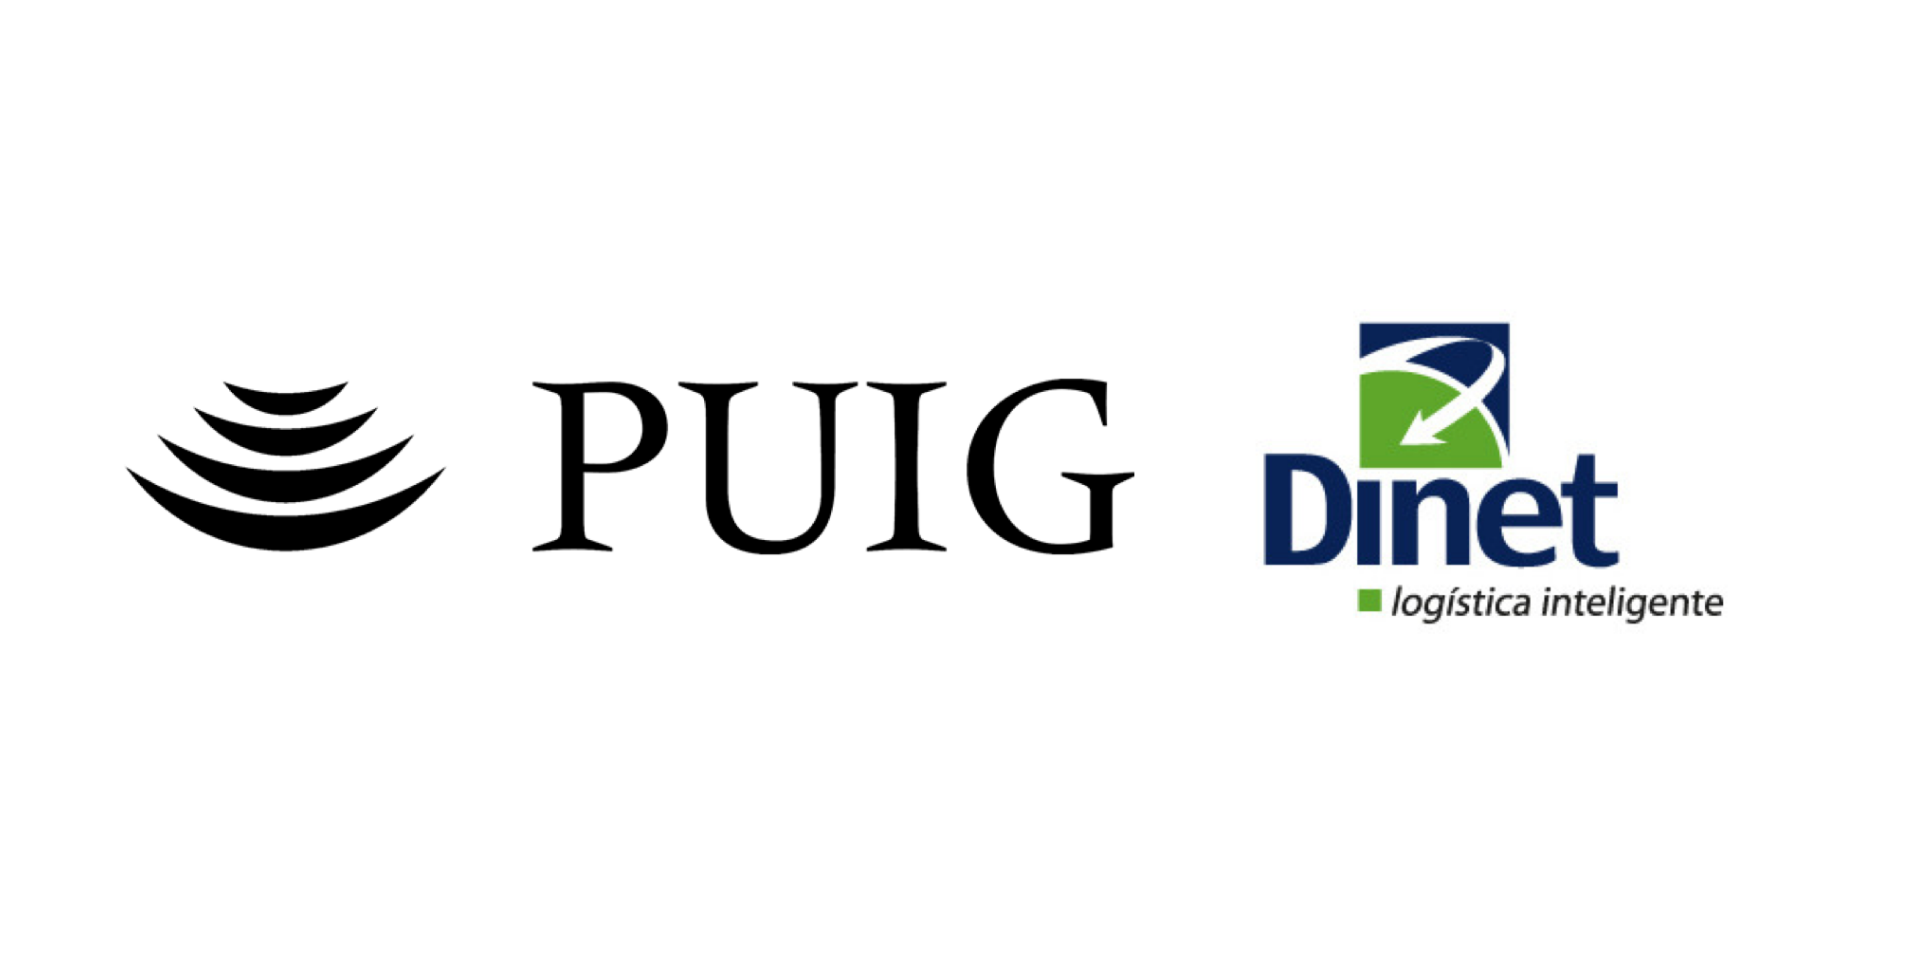 Puig – Dinet